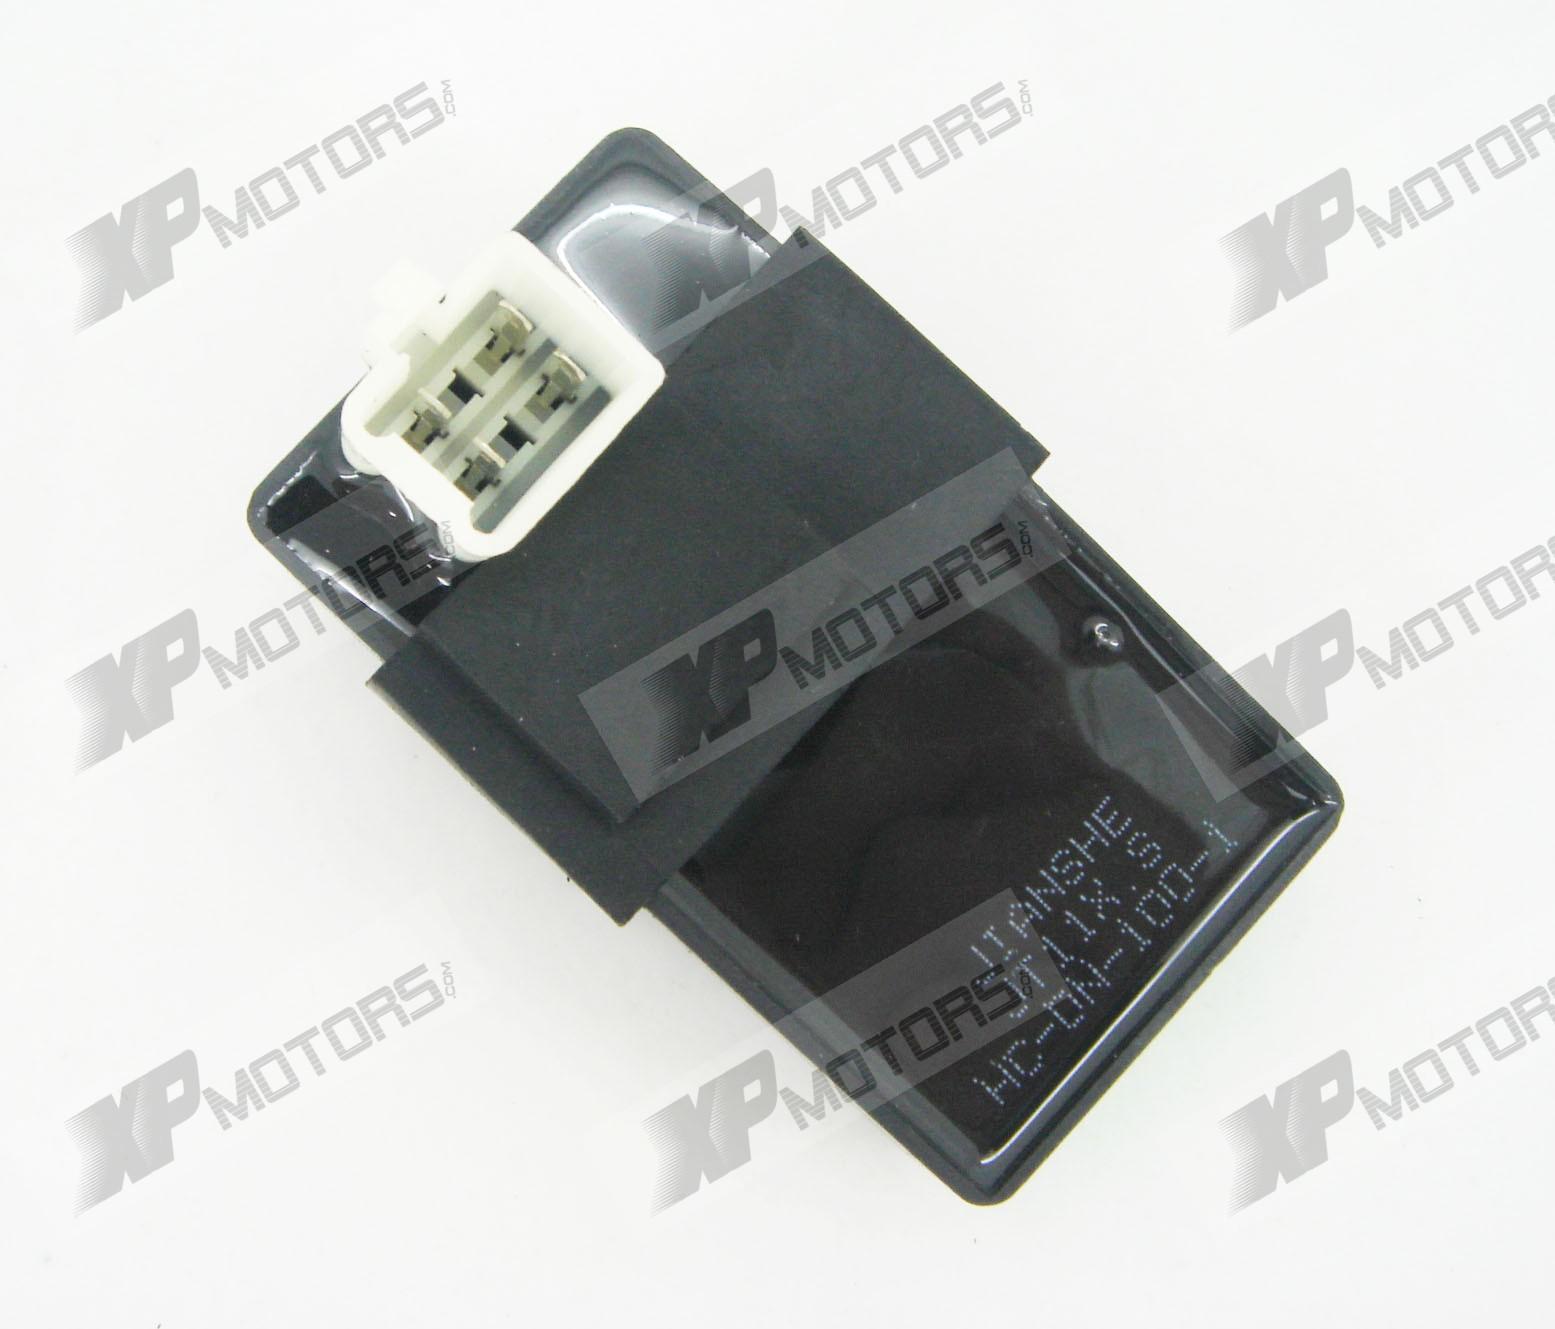 honda 6 pin cdi wiring diagram efcaviation com DC 4 PIN CDI box fit for  Honda Lifan Cub dirt pit 90 100 110CC honda